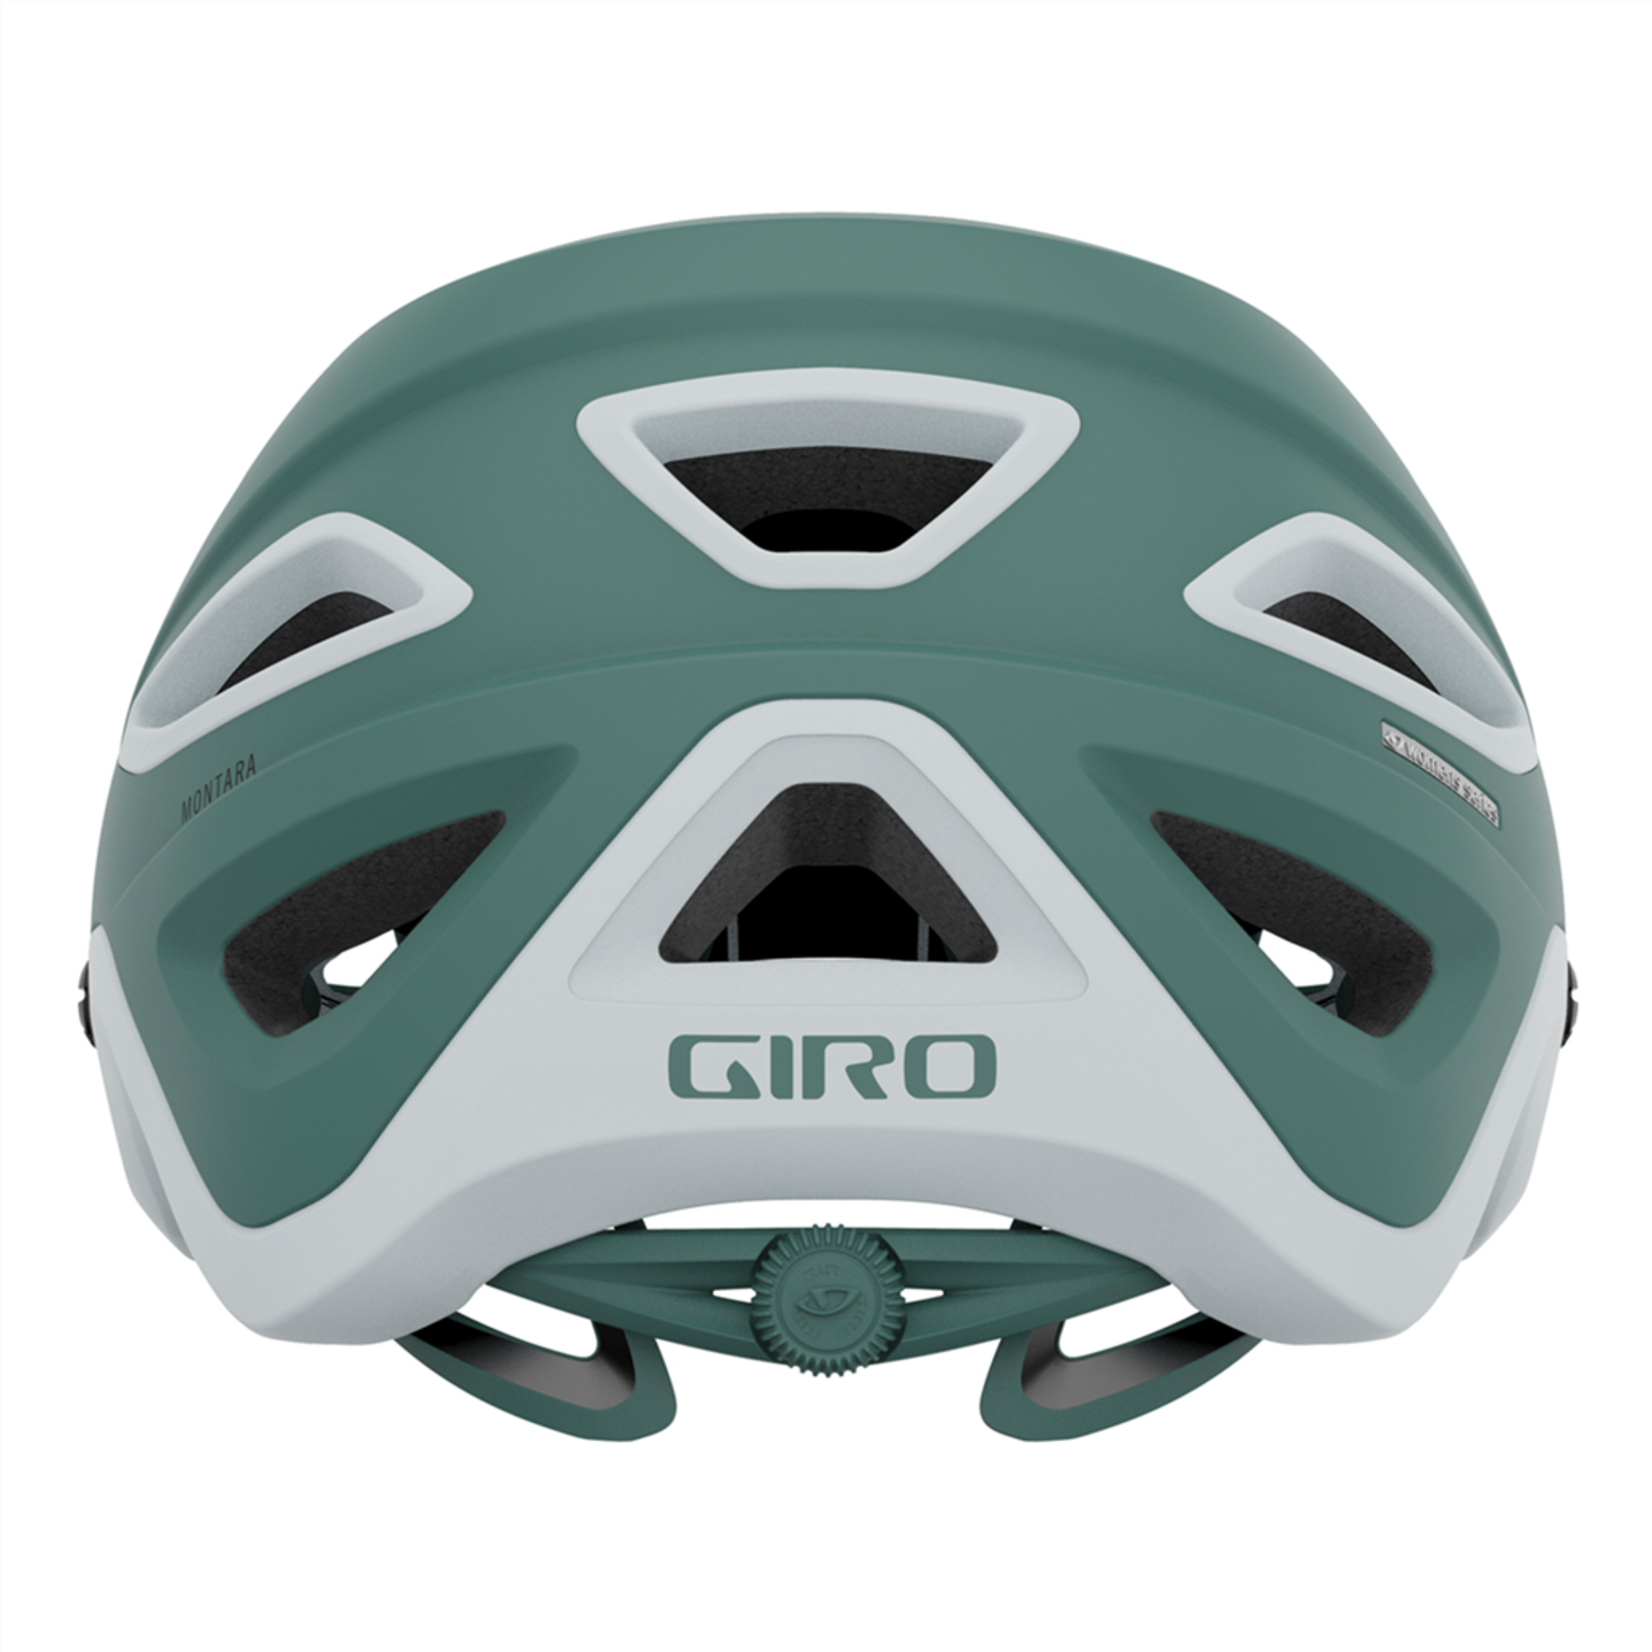 Giro GIRO - Montara MIPS - Matte Grey Green